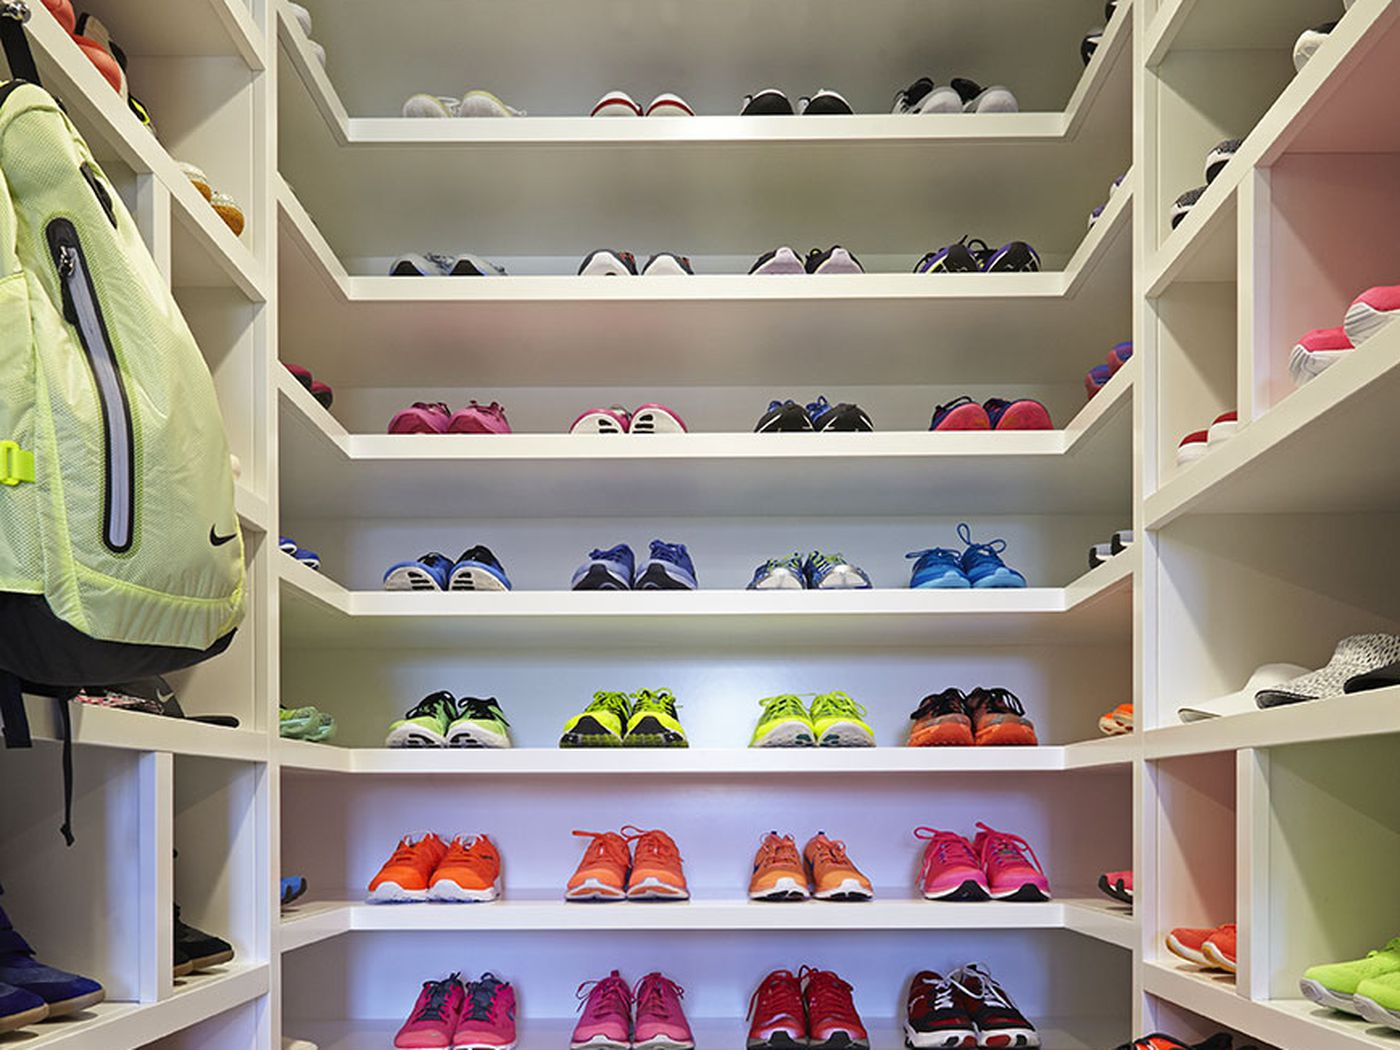 Khloe Kardashians Fitness Rebrand Includes A Massive Gorgeous Closet For Gym Stuff